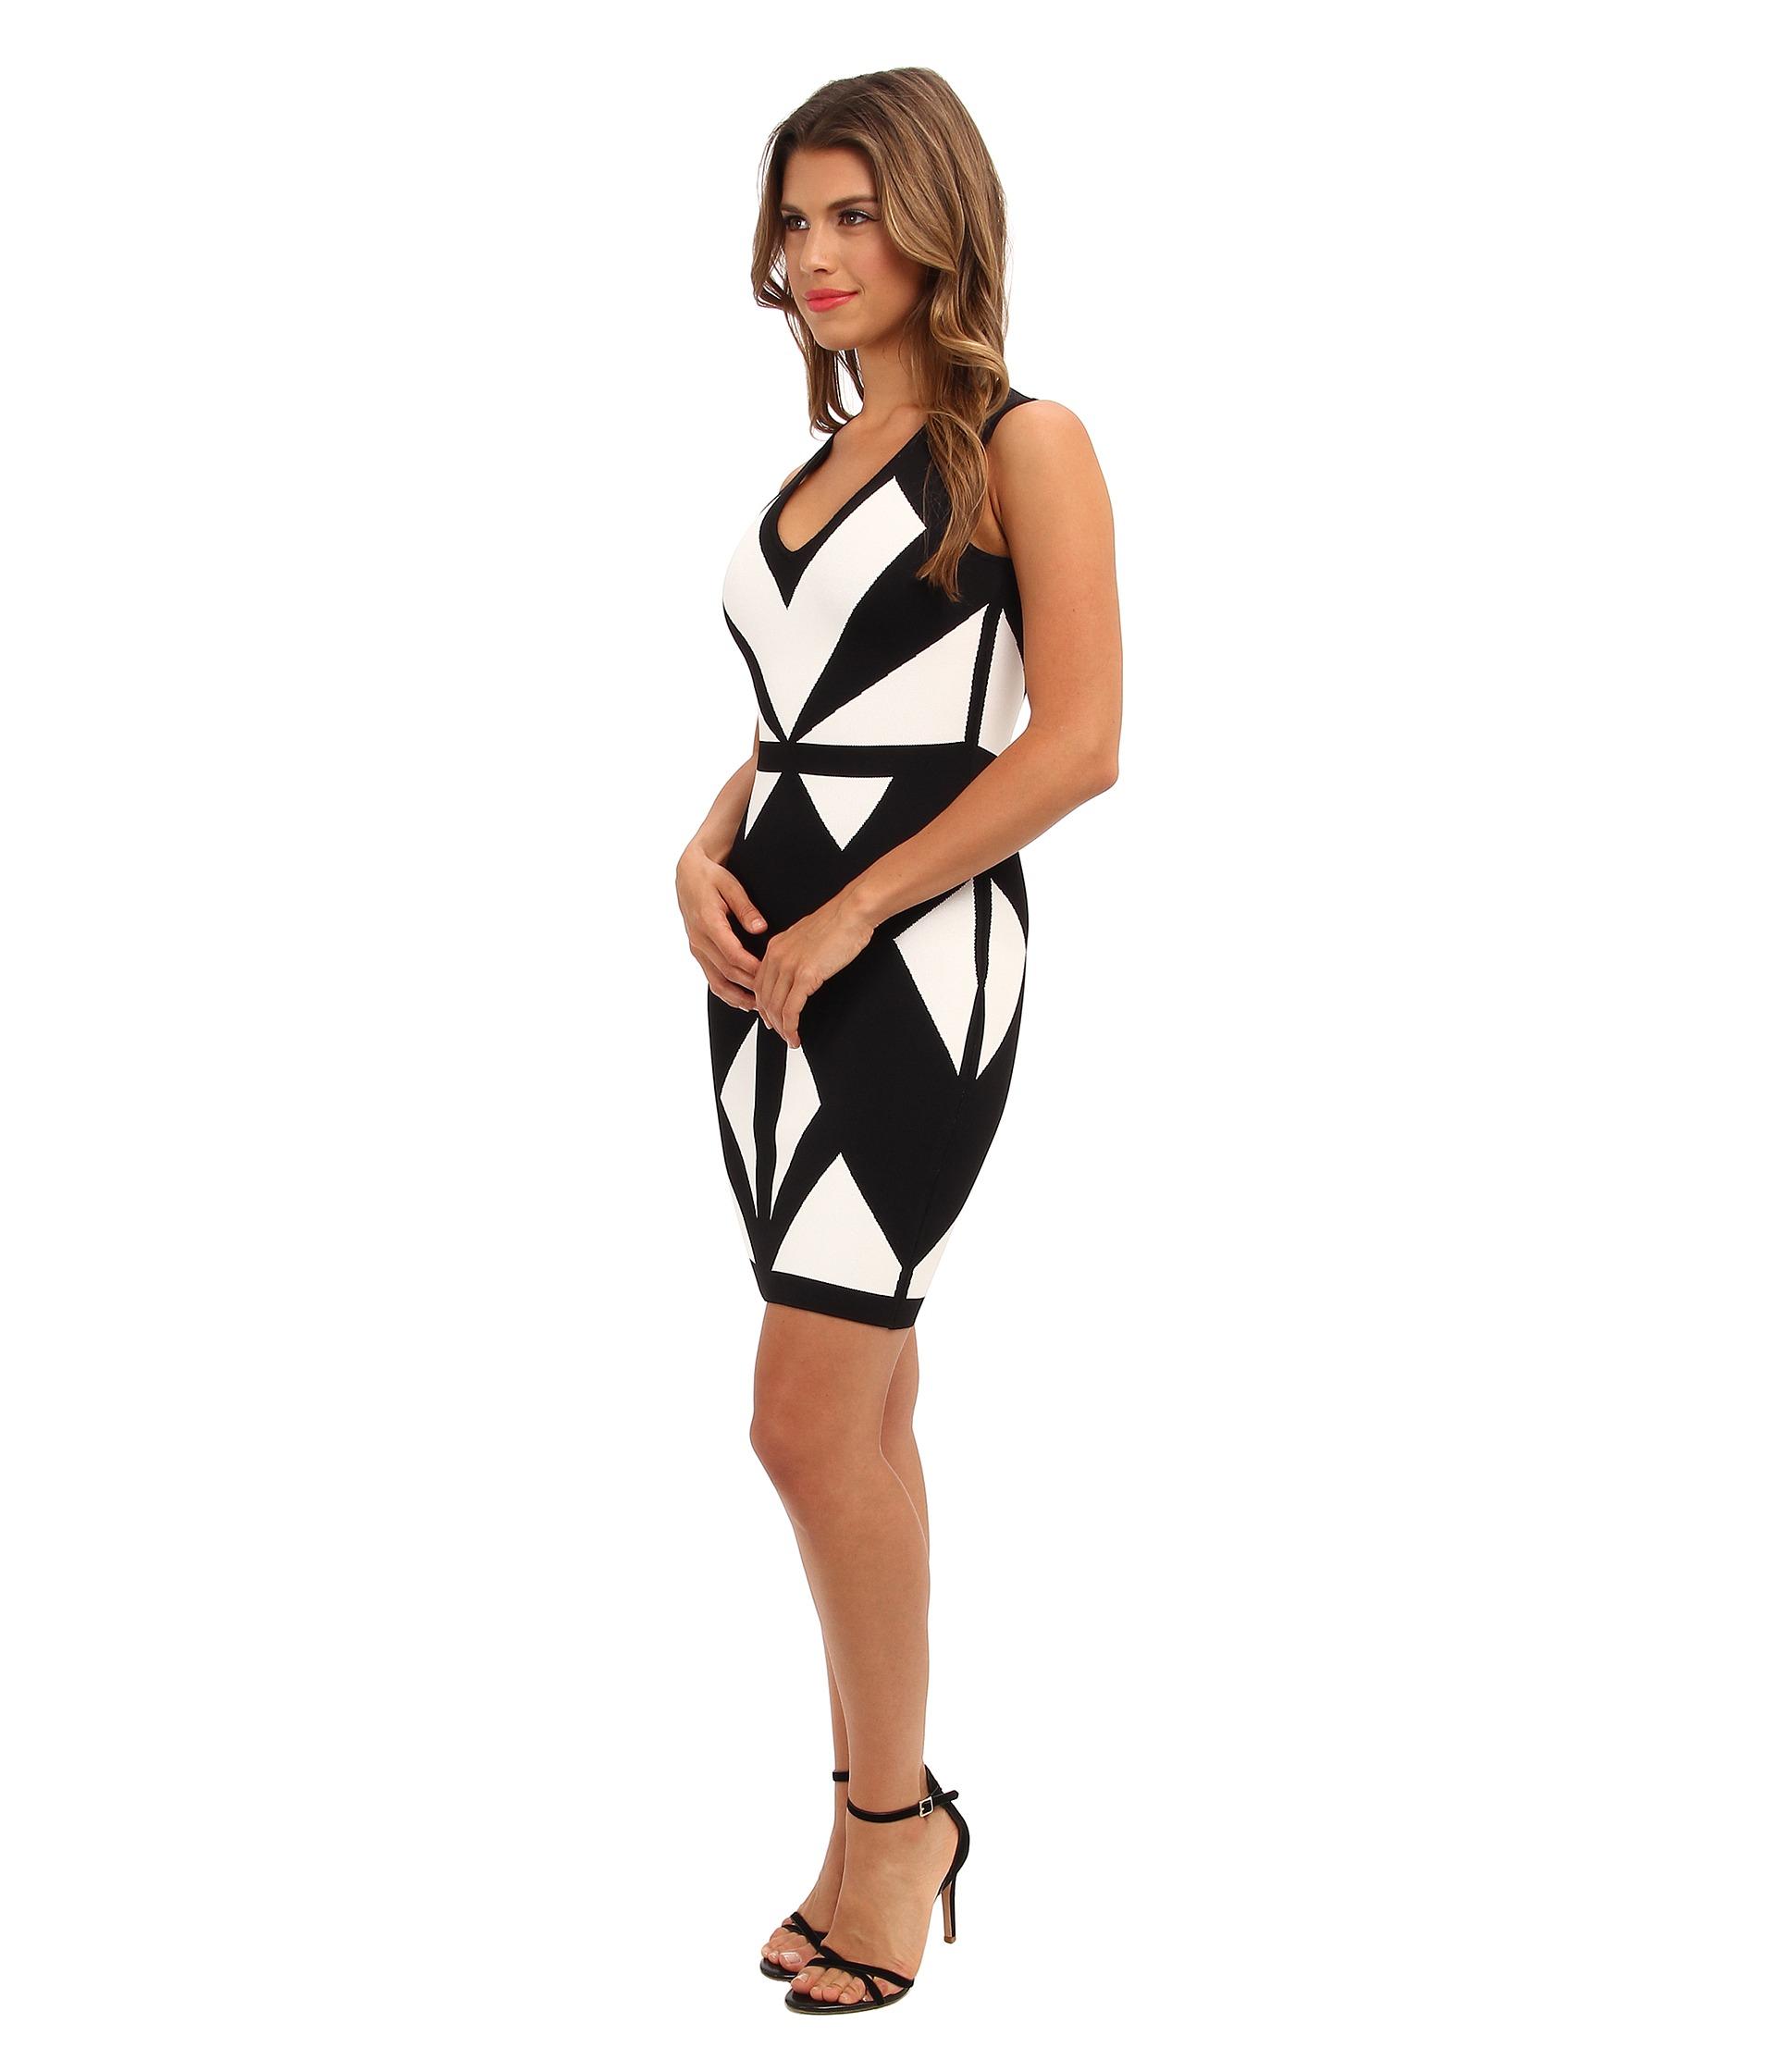 Bcbg evinna geometric dress images